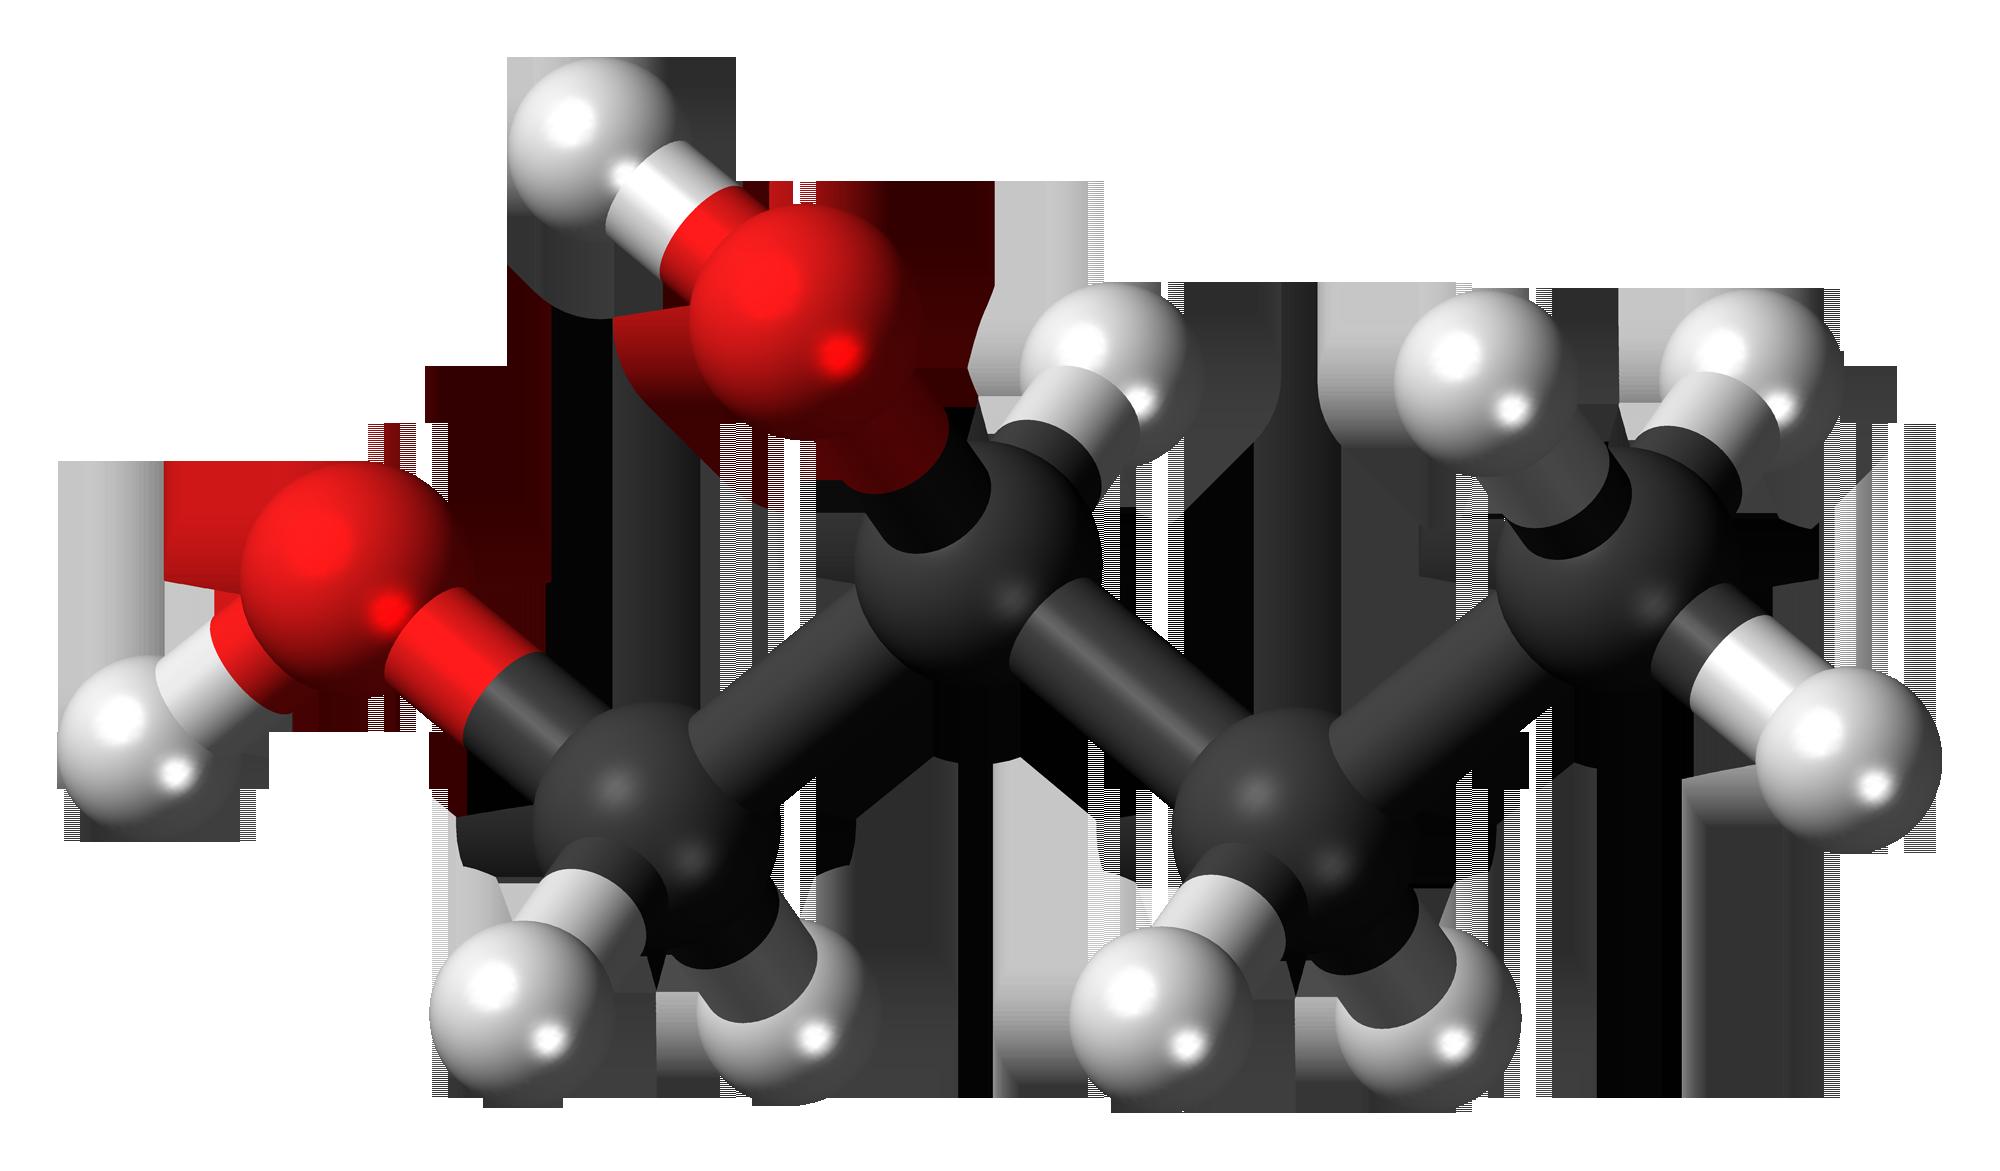 1,3 Butylene Glycol pproduction from fermentation